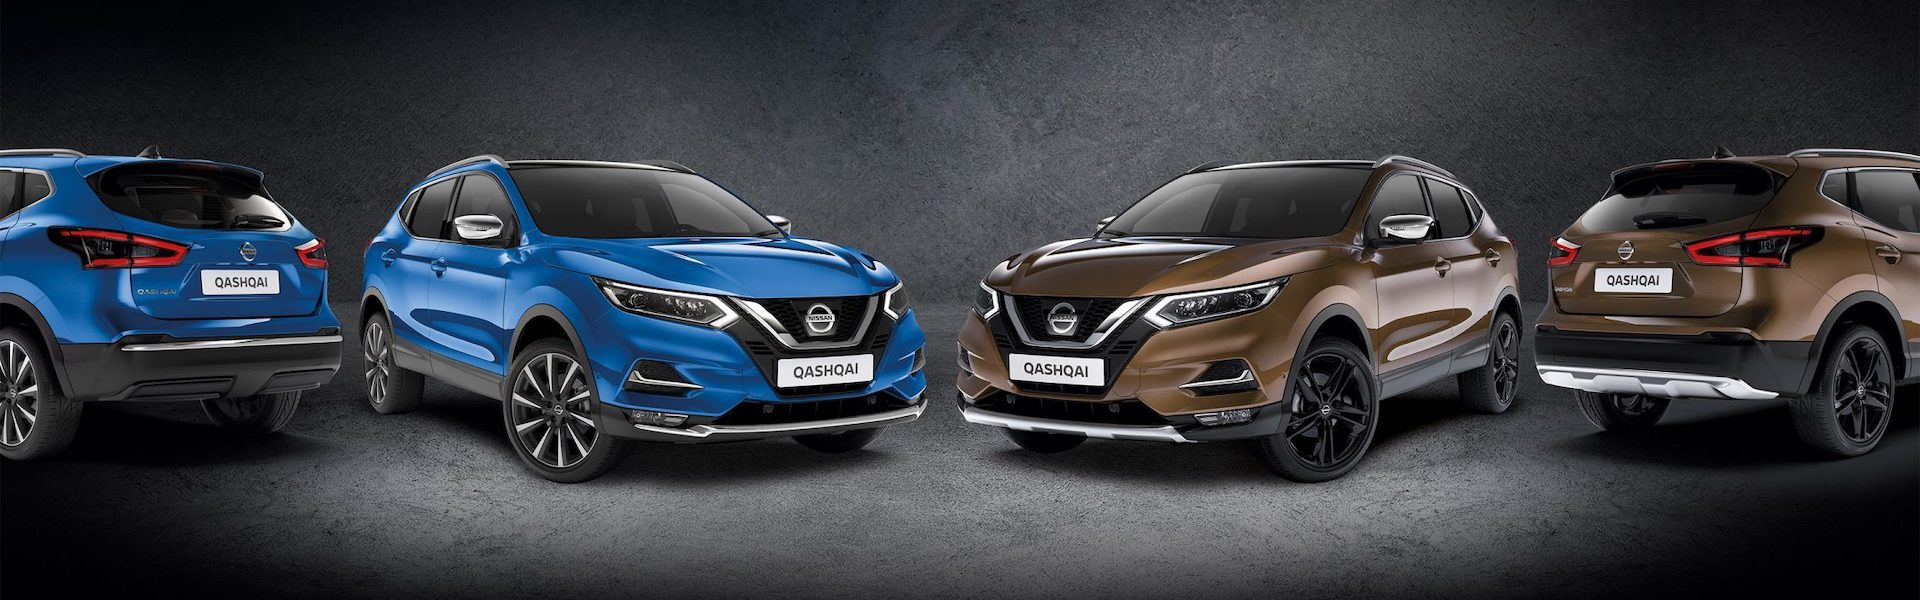 versões do Nissan Qashqai